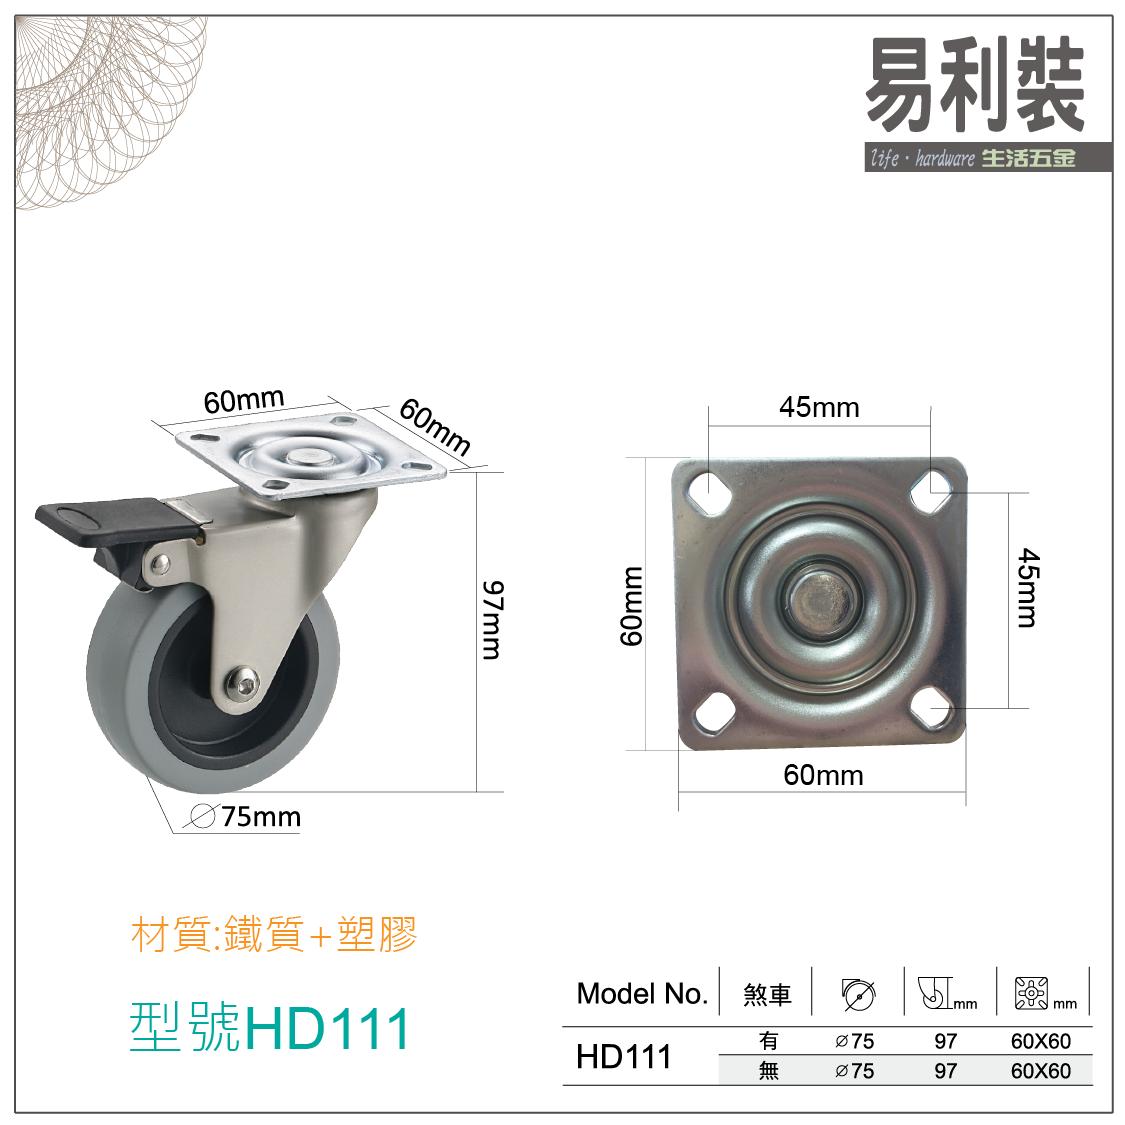 【 EASYCAN  】HD111-活動輪 易利裝生活五金 桌輪 櫃輪 房間 臥房 衣櫃 小資族 辦公家具 系統家具 1